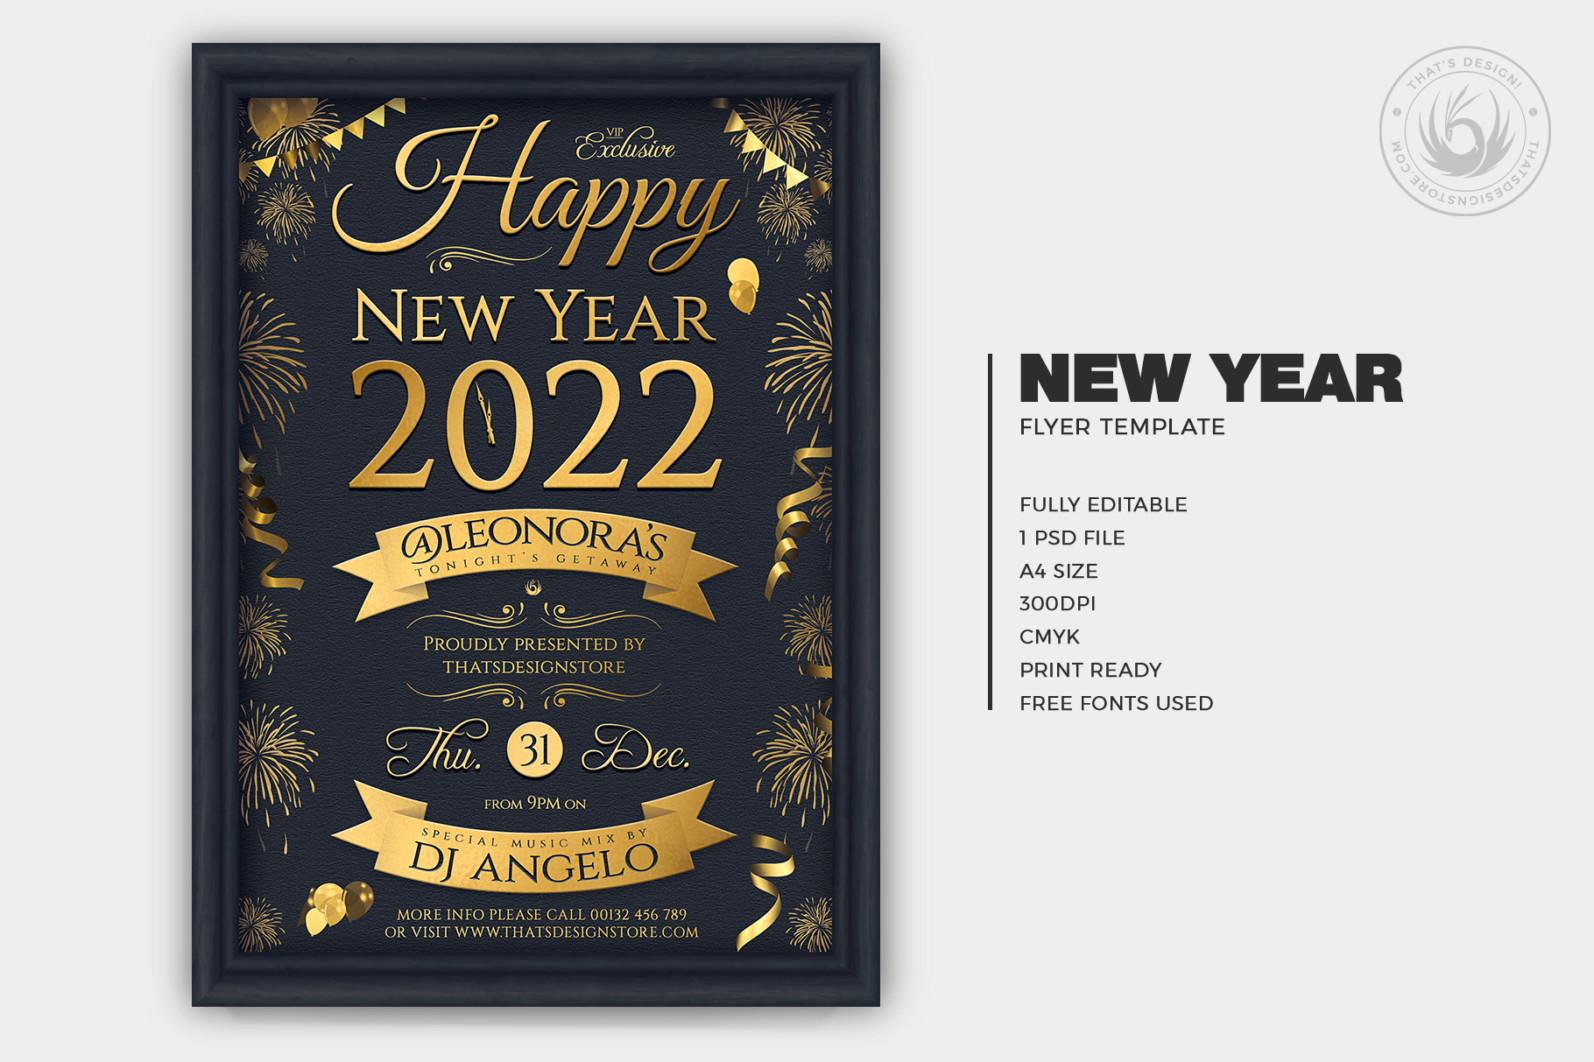 New Year Flyer Template V5 - 01 New Year Flyer Template V5 -